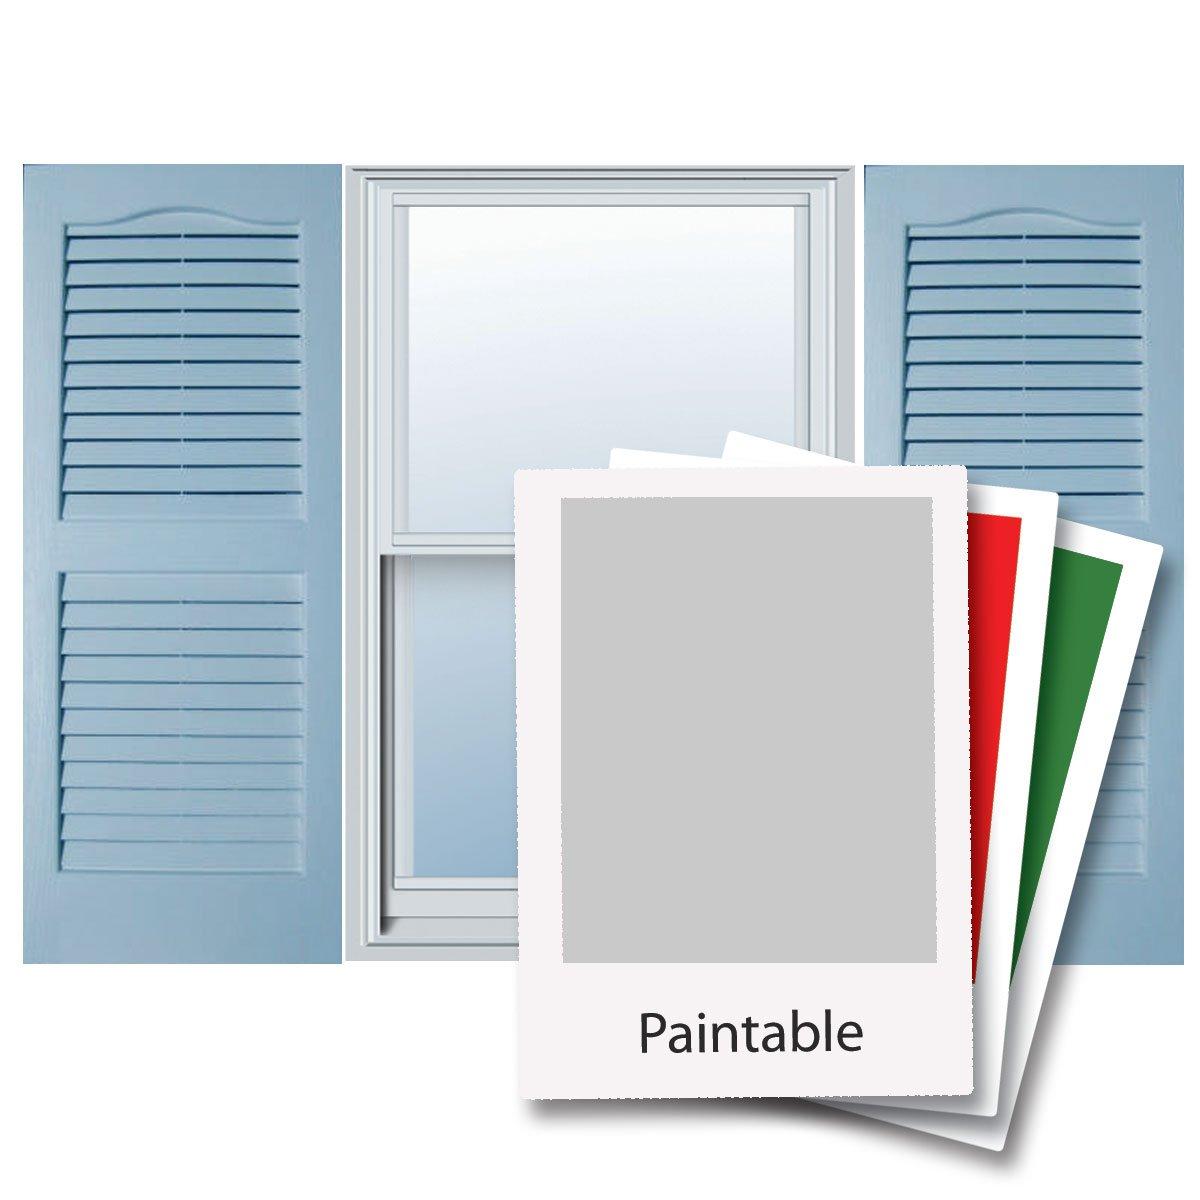 14'' x 62'' Builders Choice Vinyl Open Louver Window Shutters, w/Shutter Spikes & Screws (Per Pair), Paintable